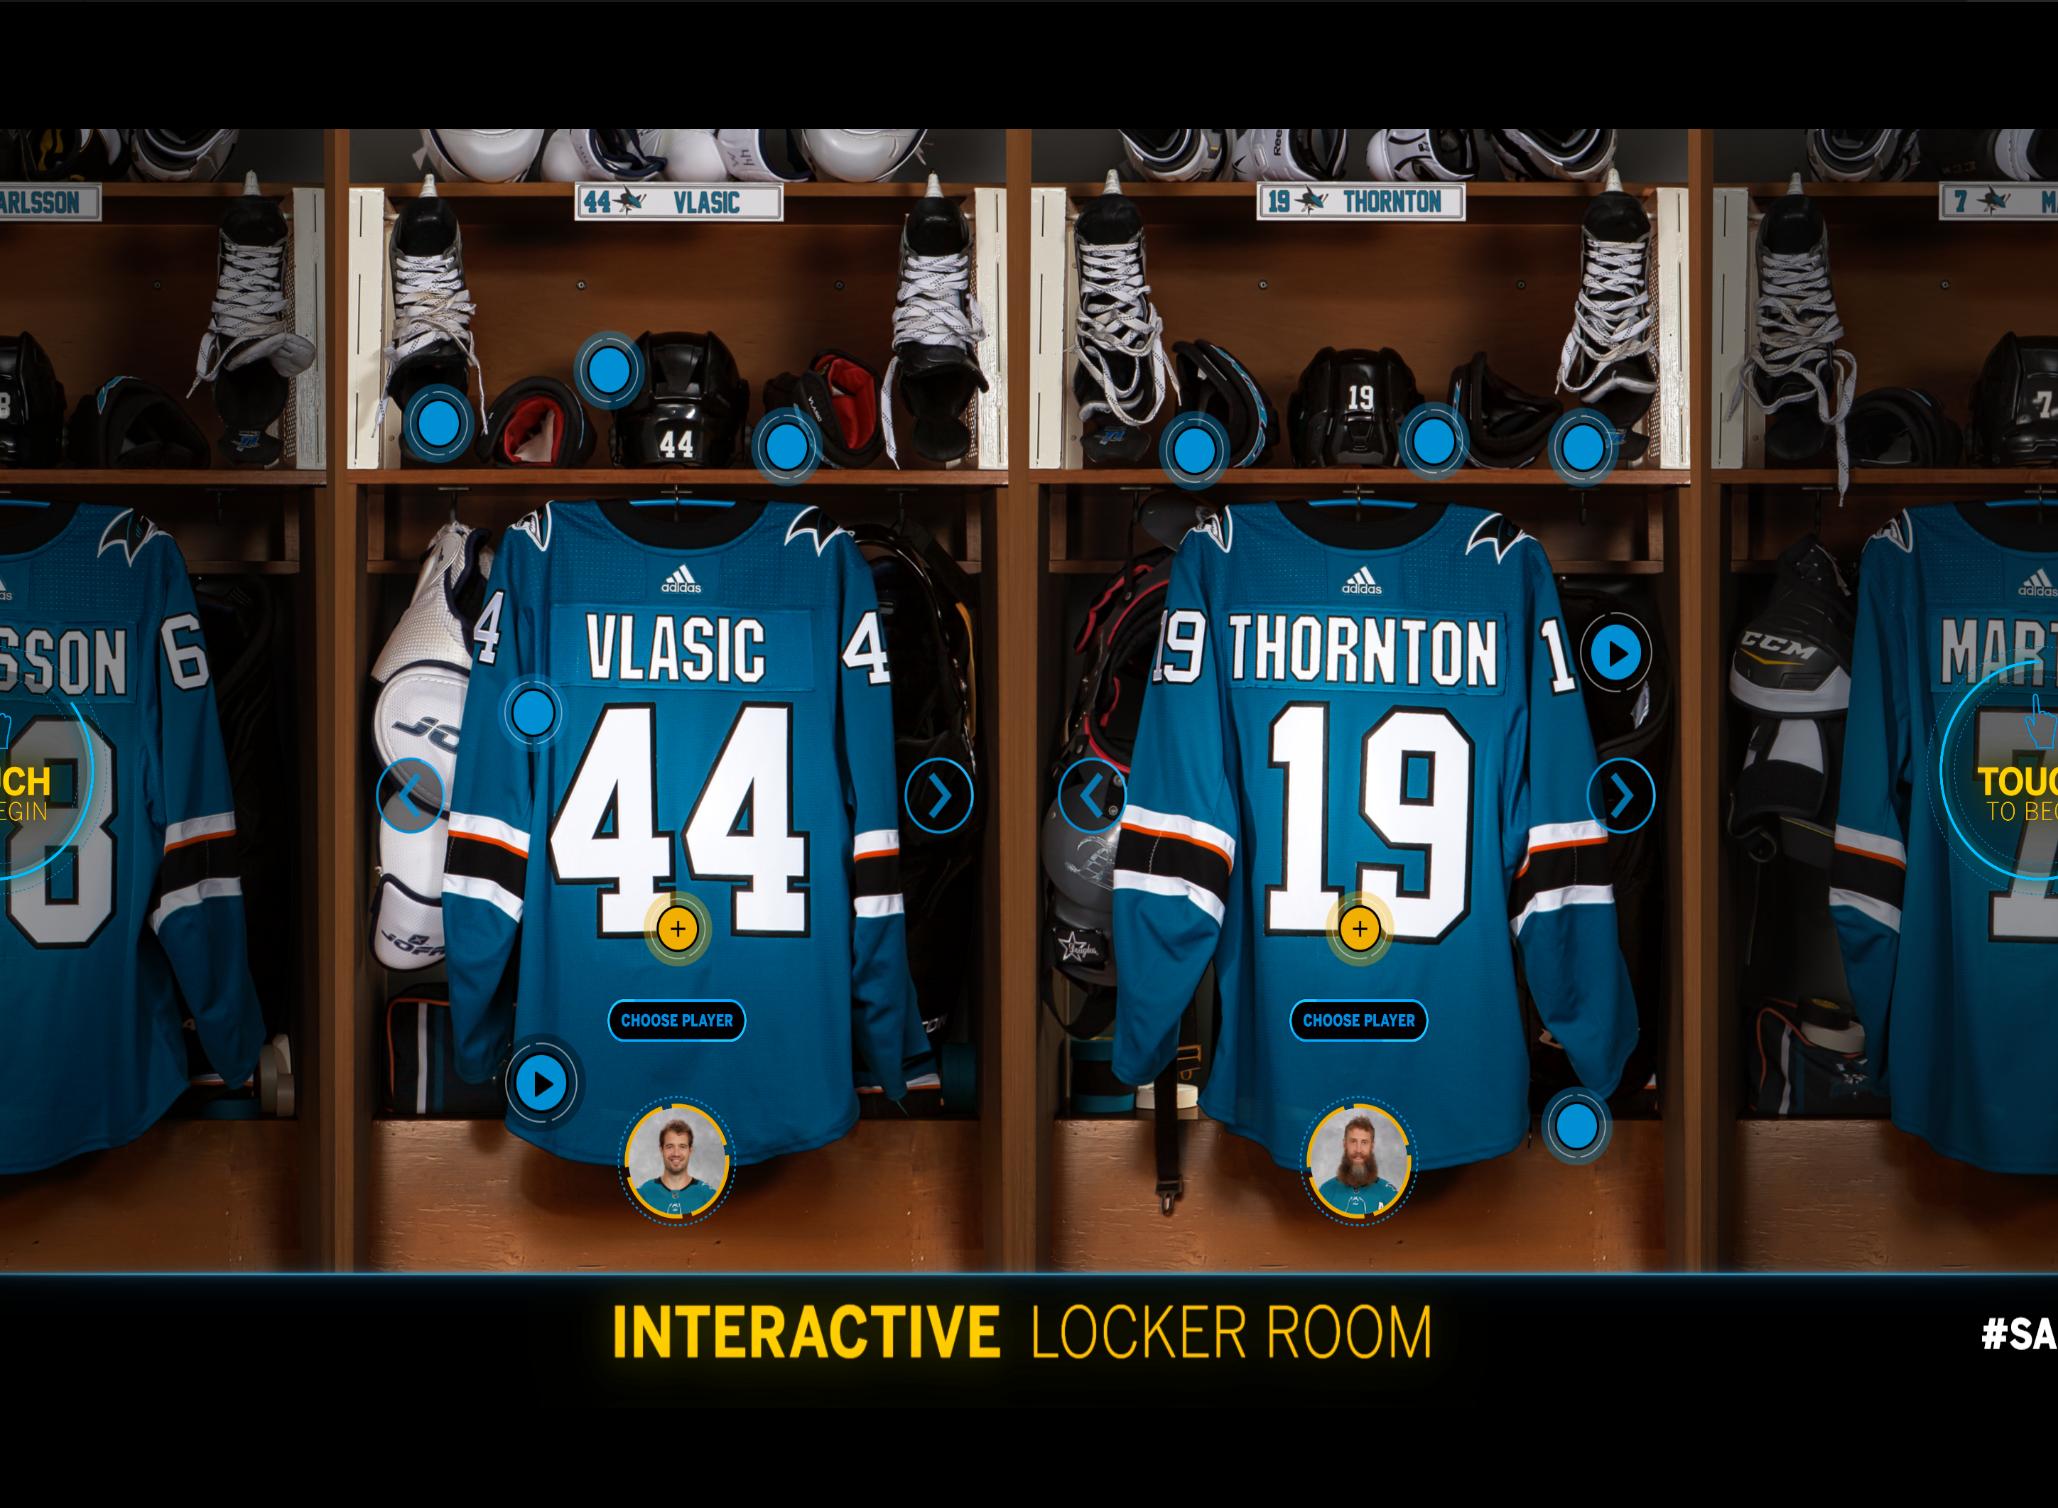 SAP Interactive Locker Room Experience